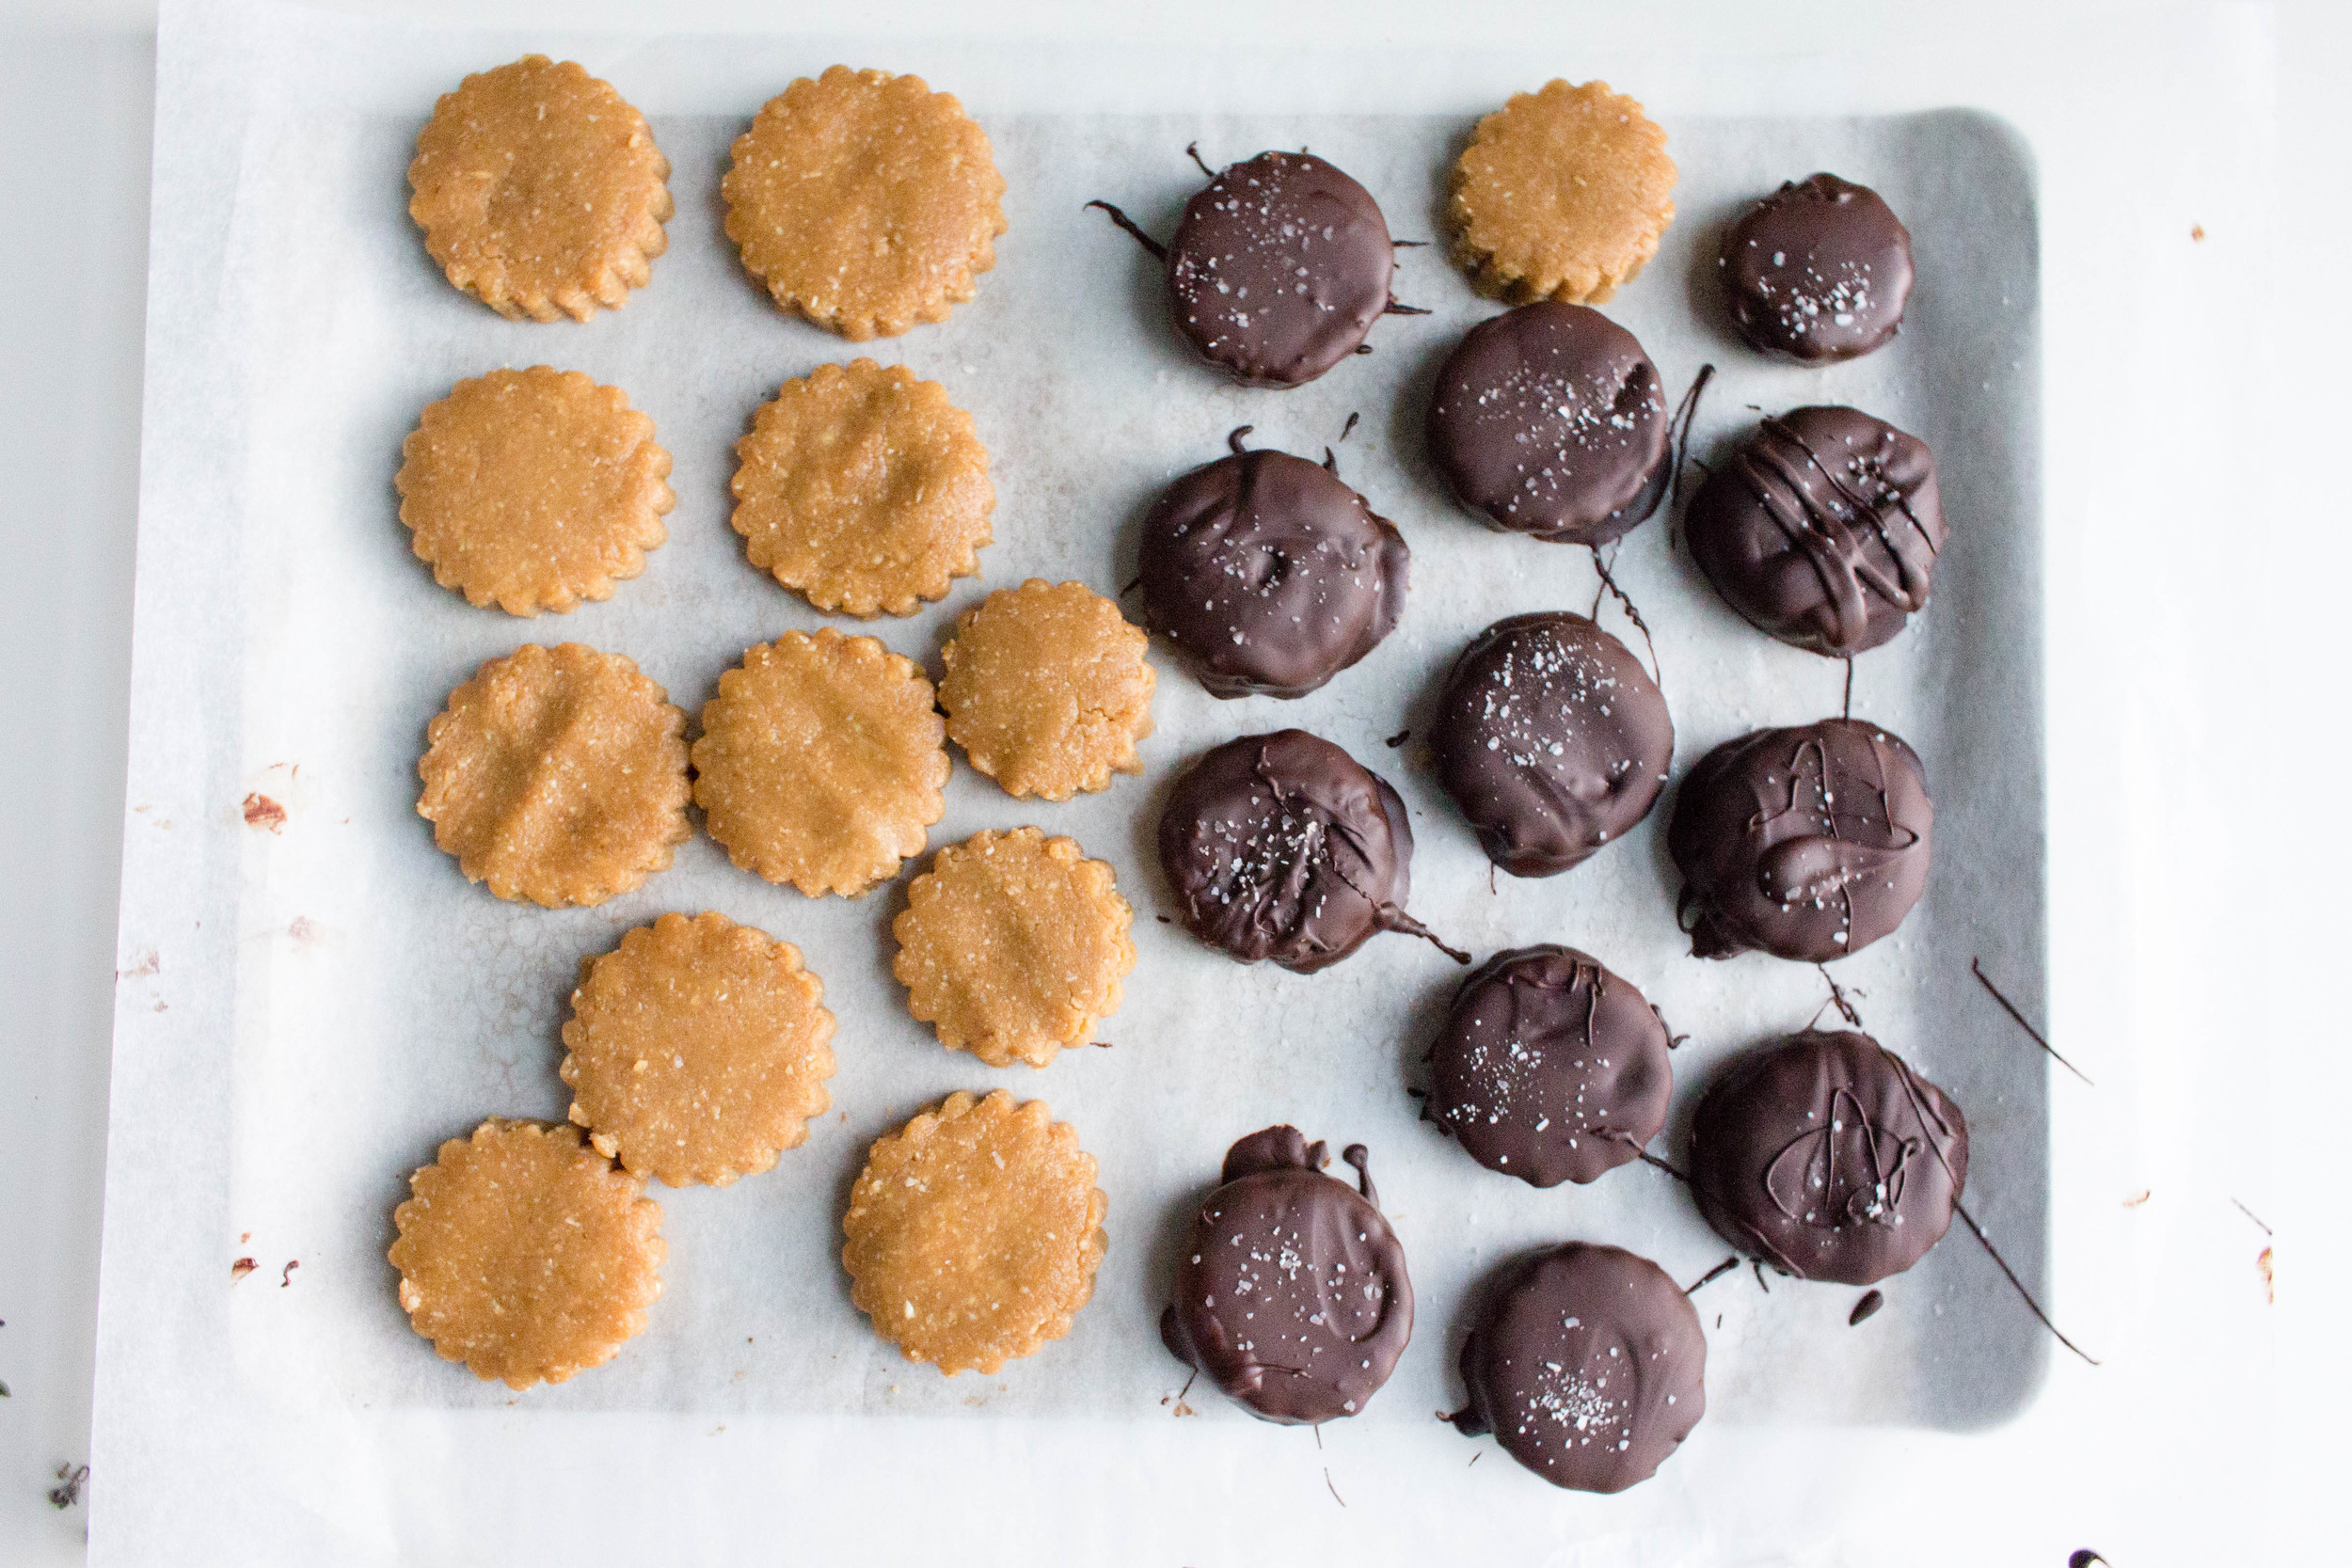 All of It - Vegan Dark Chocolate Peanut Butter Coins